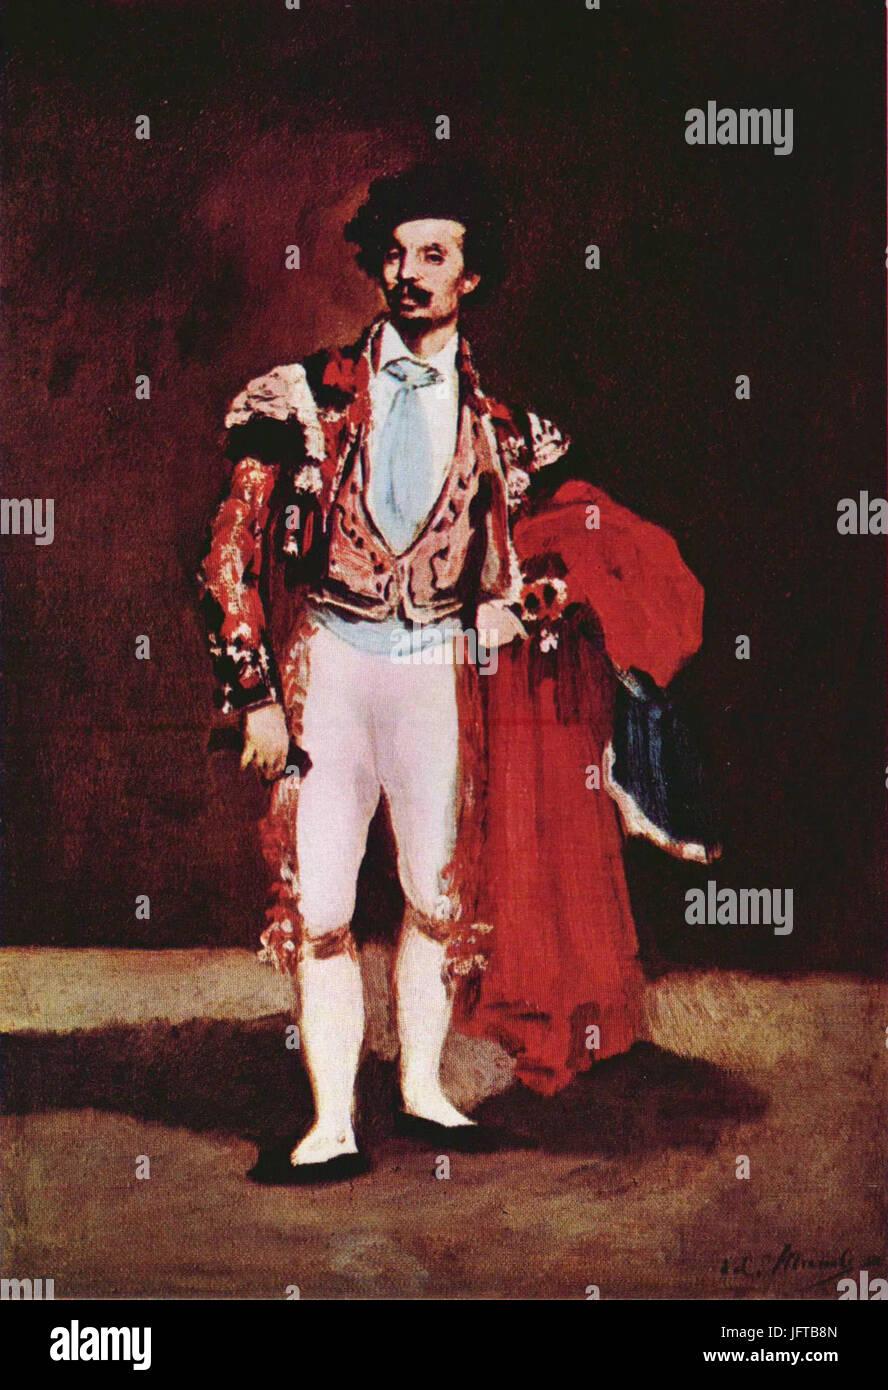 Édouard Manet - Ballerin, Mariano Camprubi (RW 54) - Stock Image